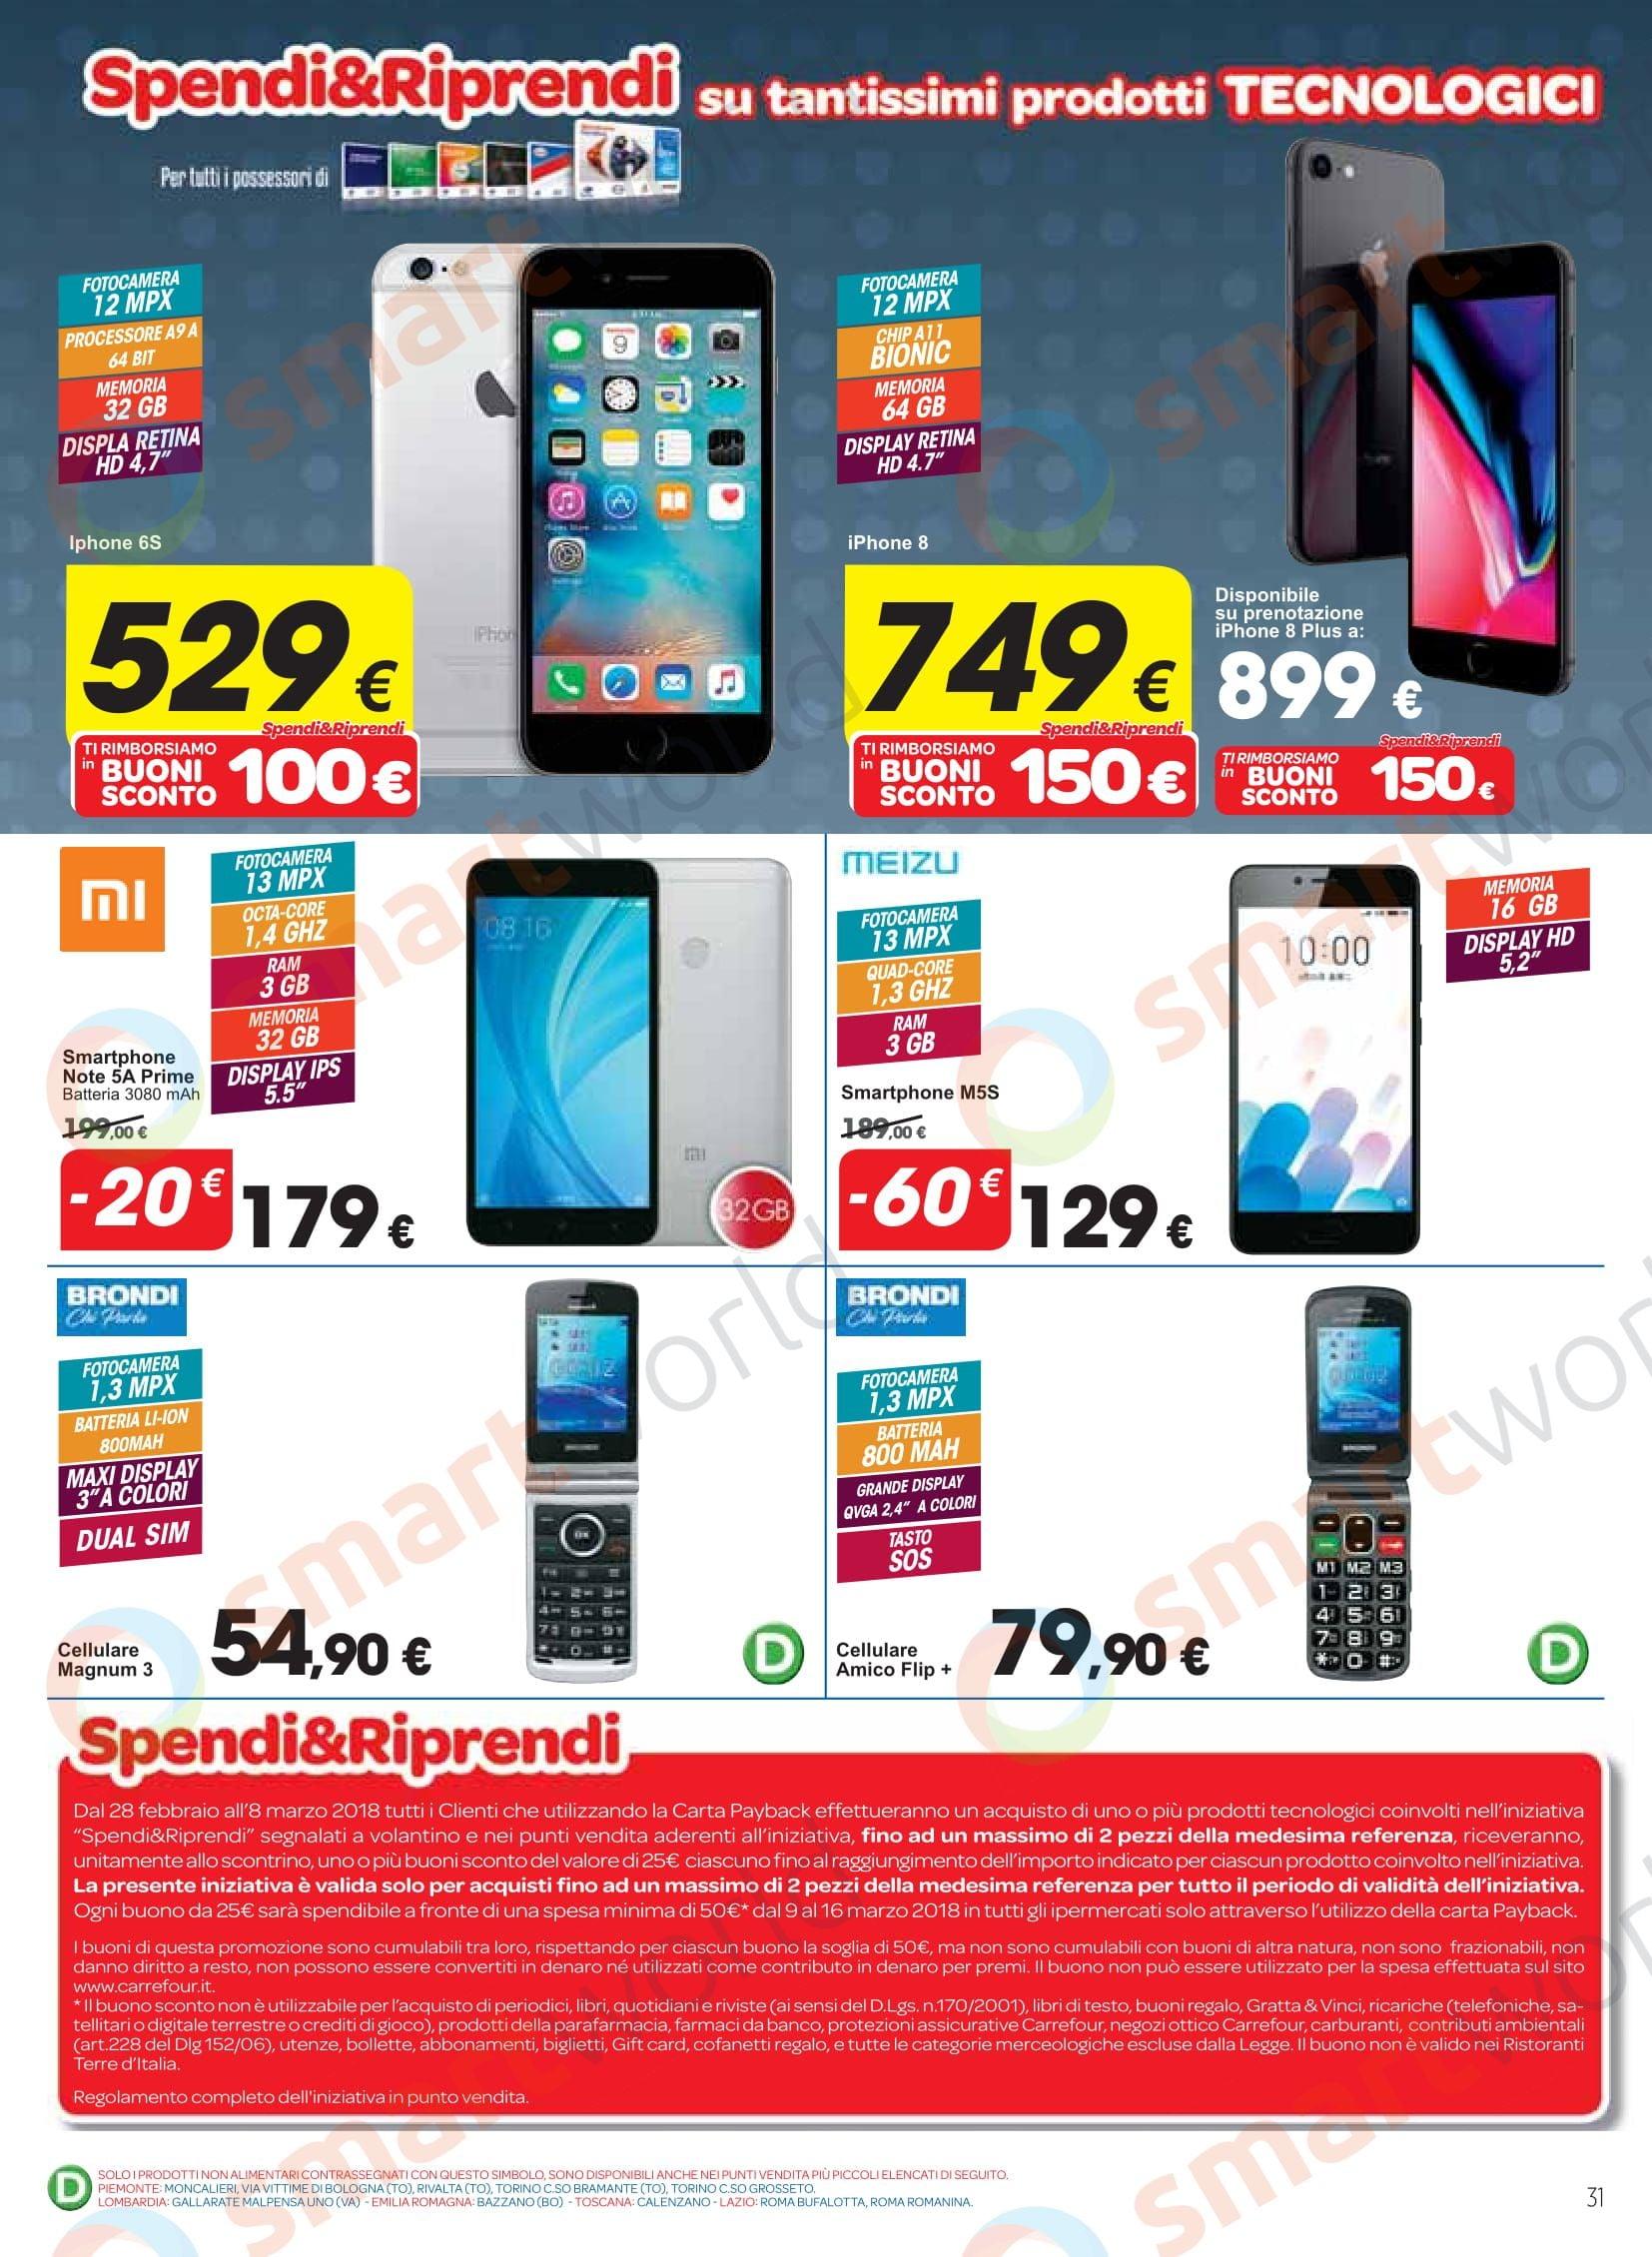 Volantino Carrefour 28 febbraio - 8 marzo: iPhone X, Galaxy